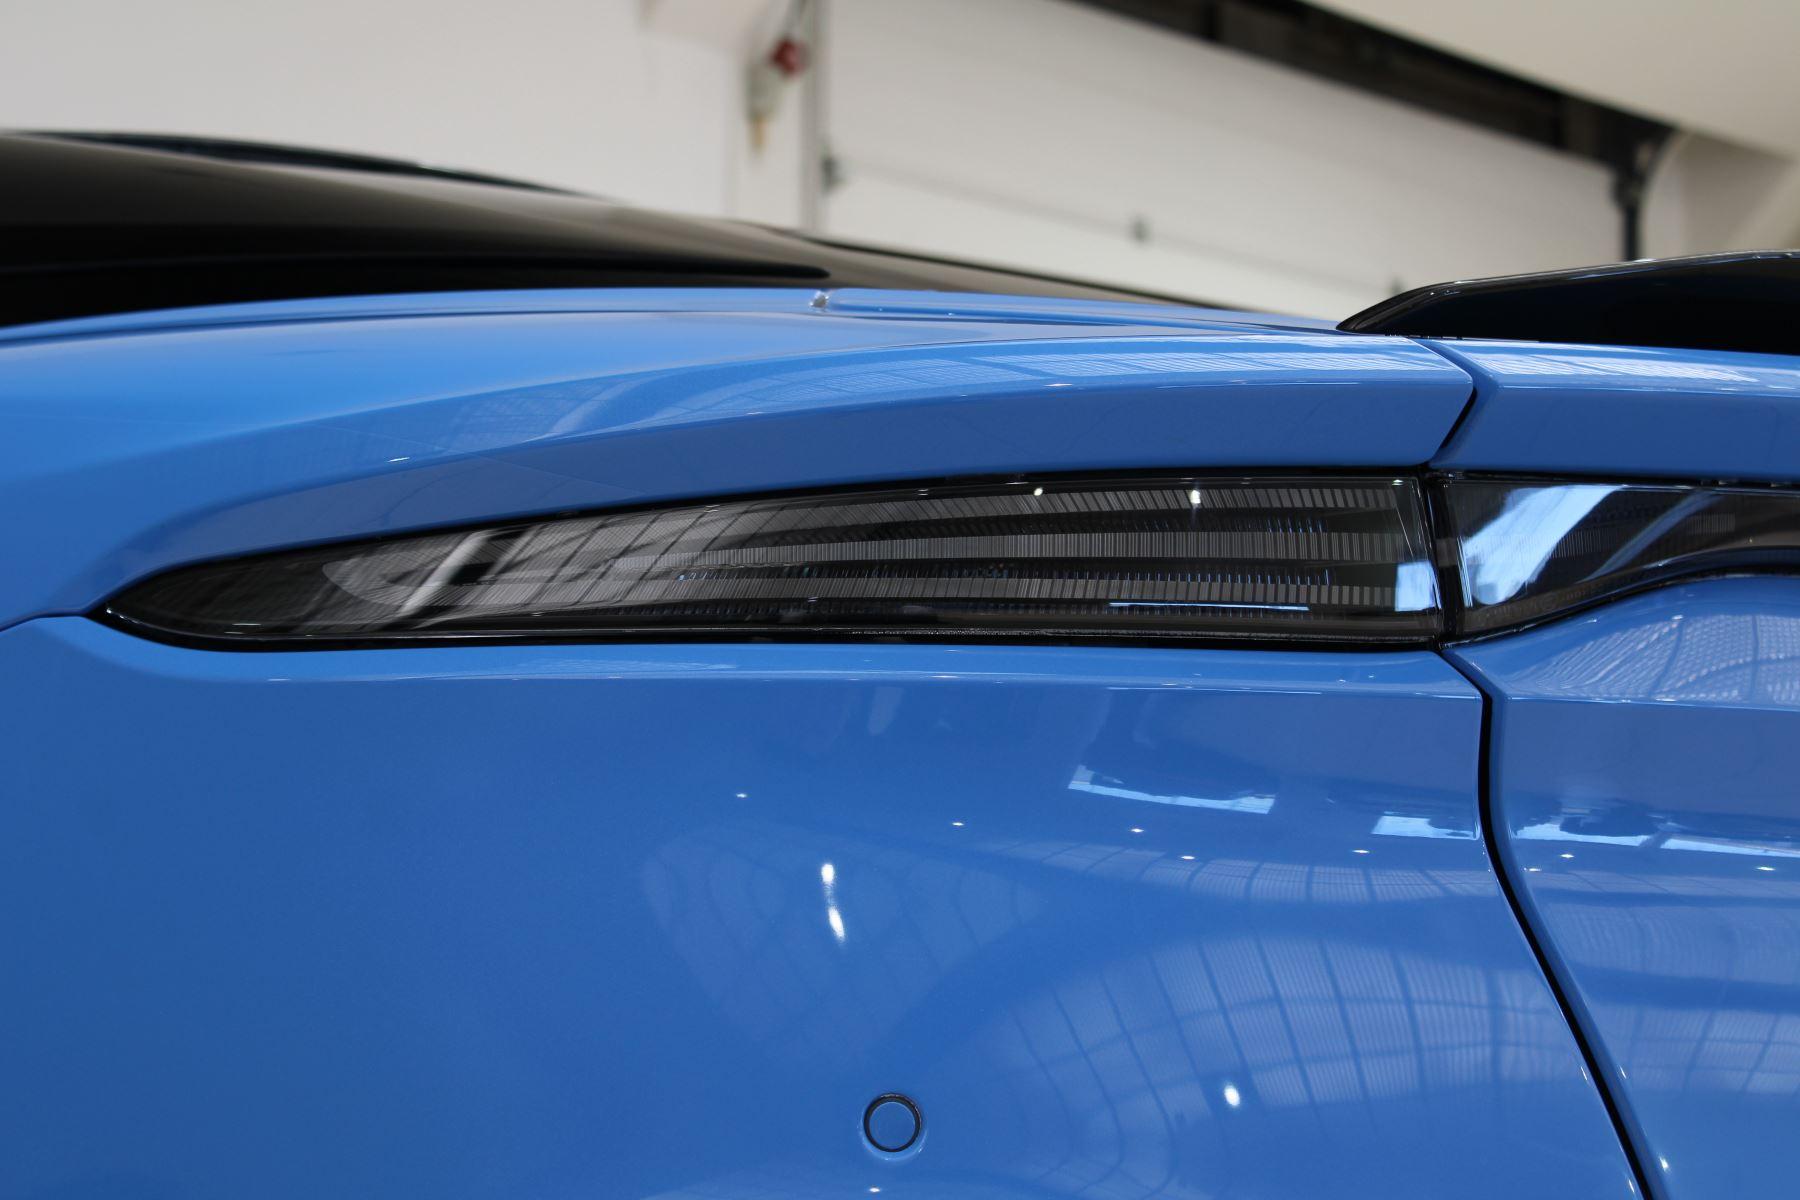 Aston Martin DBS V12 Superleggera Touchtronic Special Ceramic Blue - B&O image 17